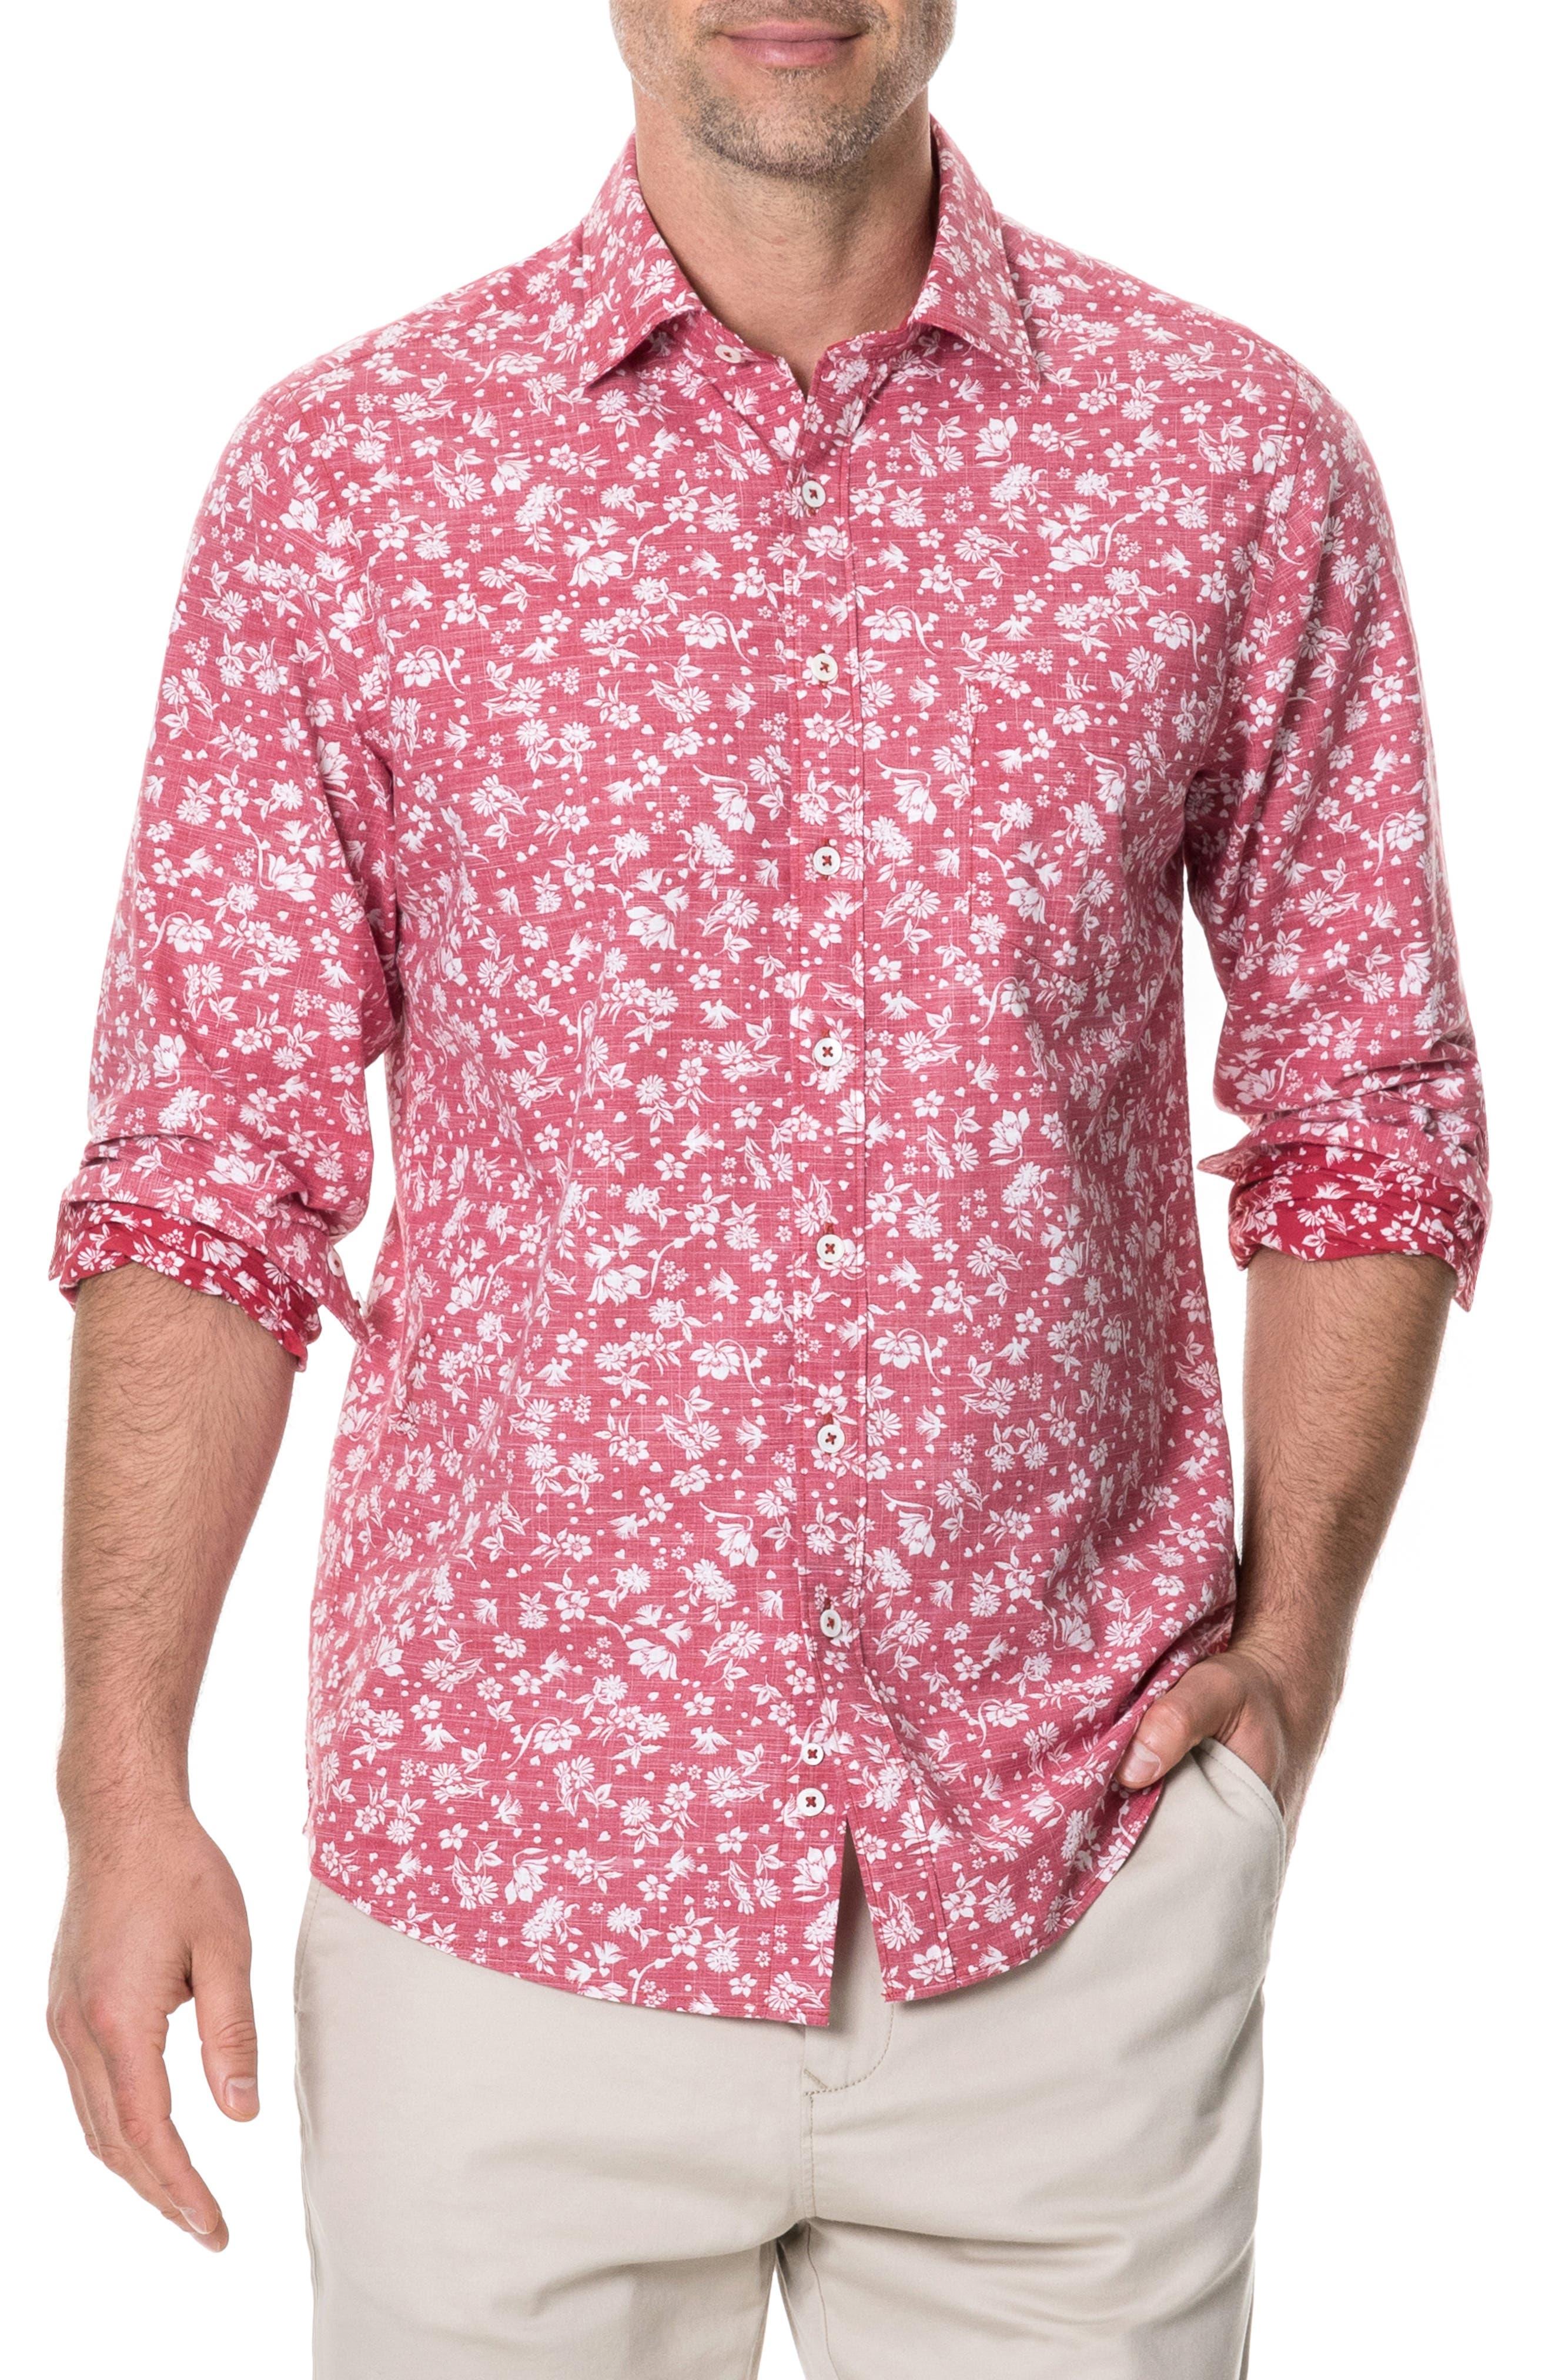 Image of RODD AND GUNN Ramsay Regular Fit Floral Print Cotton Shirt